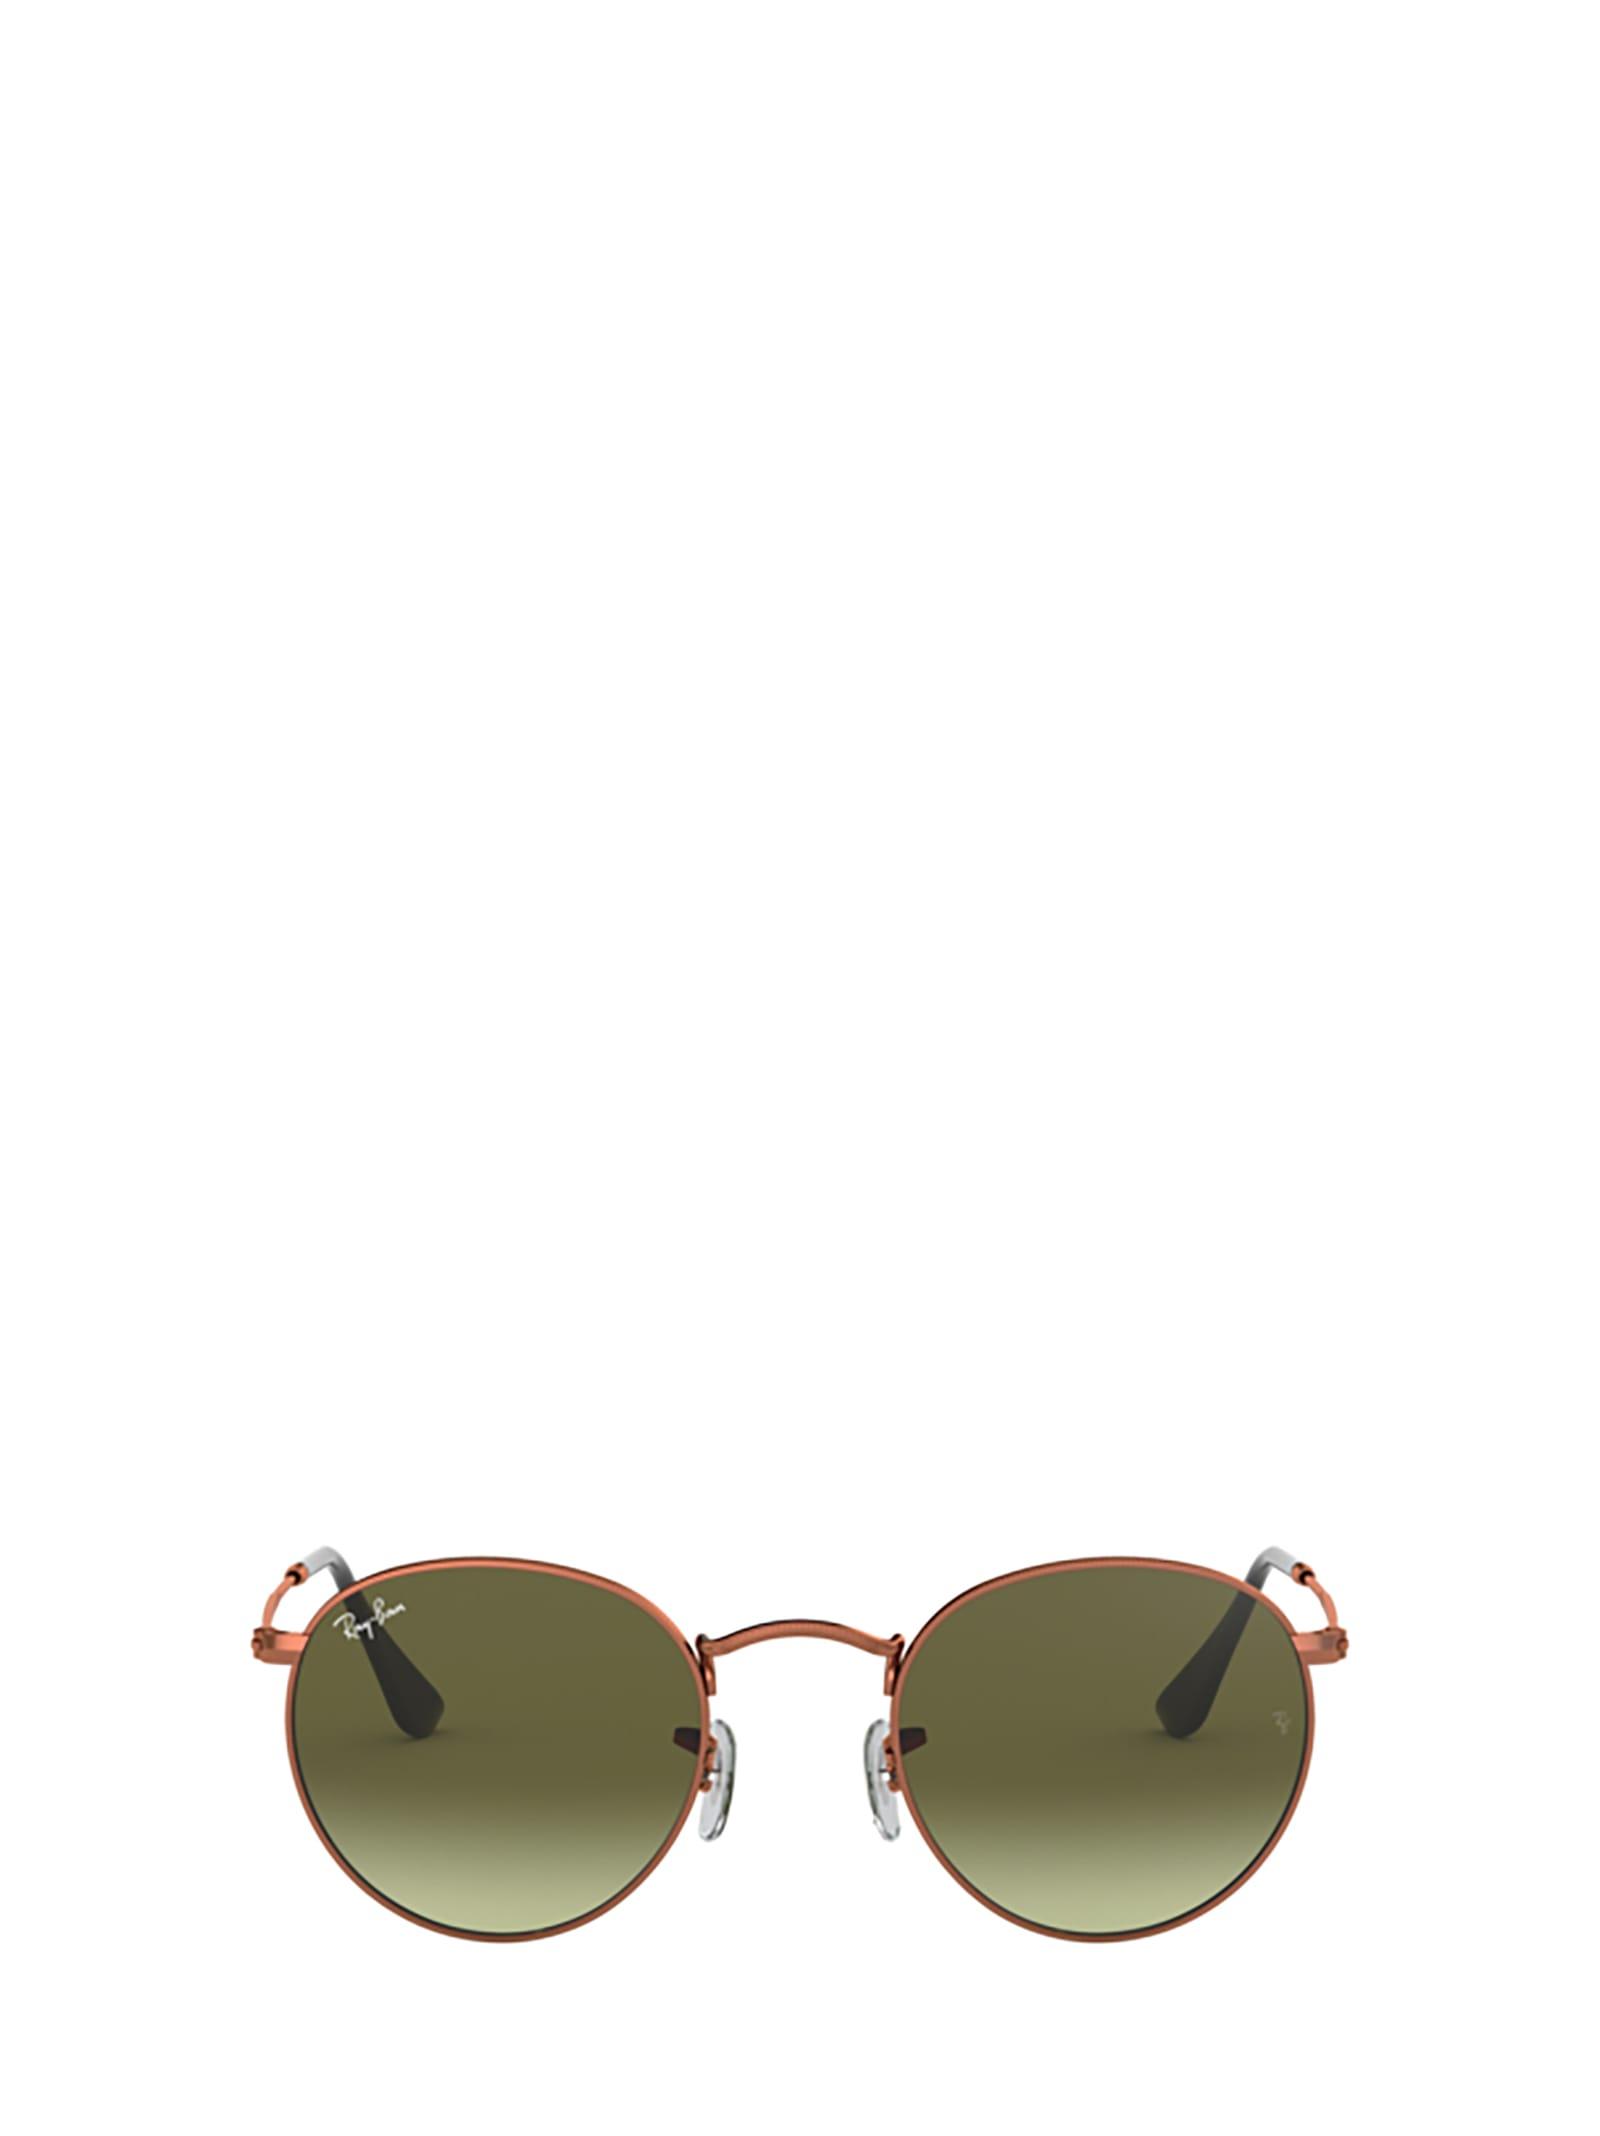 Ray-Ban Ray-ban Rb3447 Medium Bronze Sunglasses